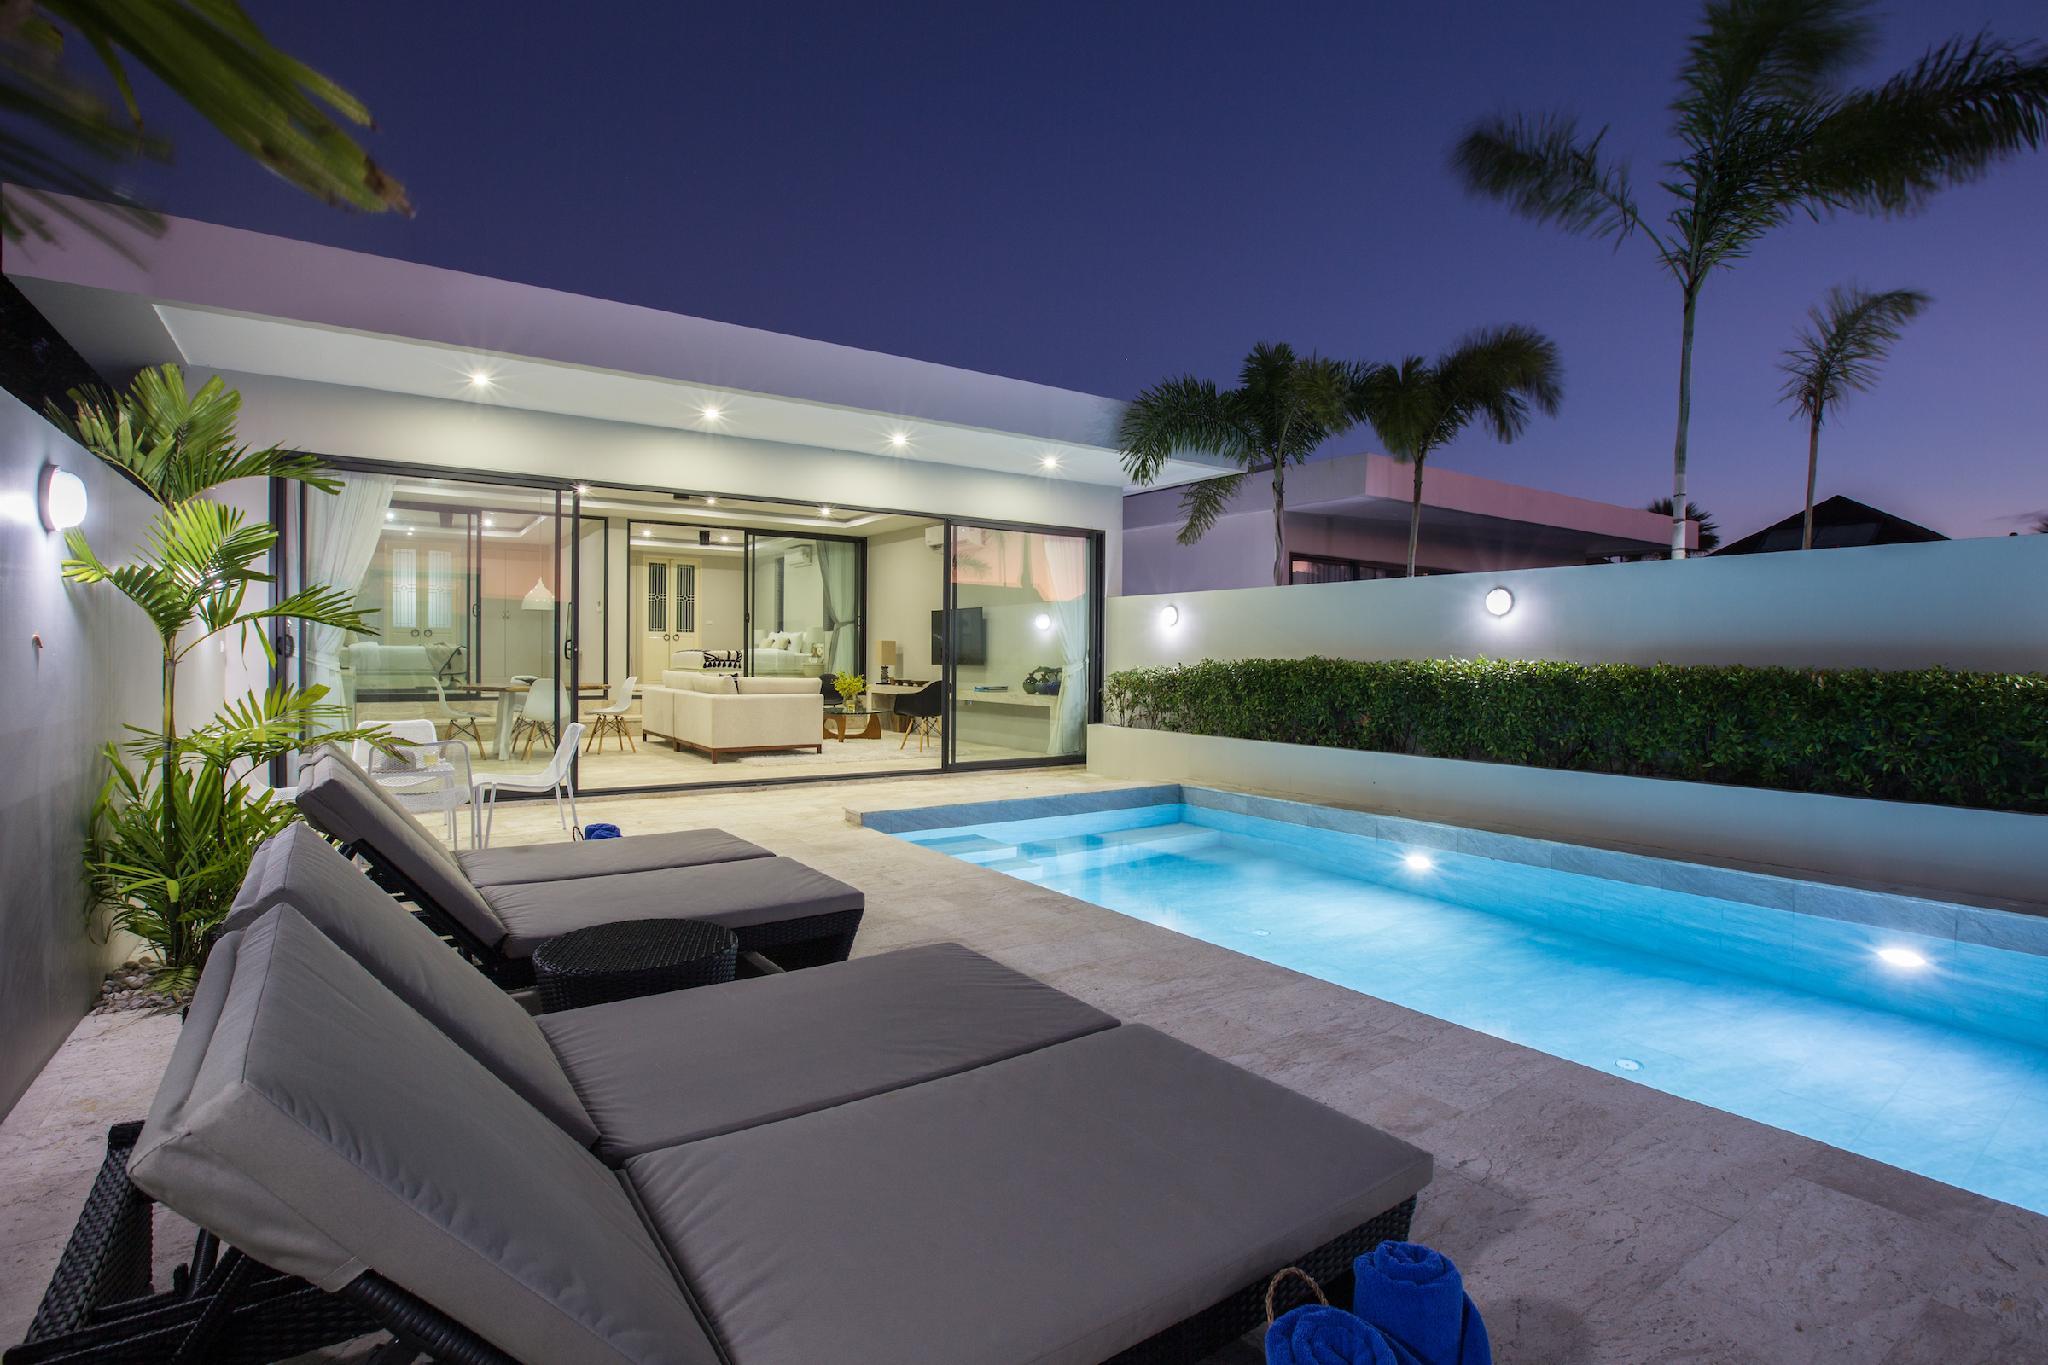 Villa Saam At Skye Beach 2BDRM Private Pool